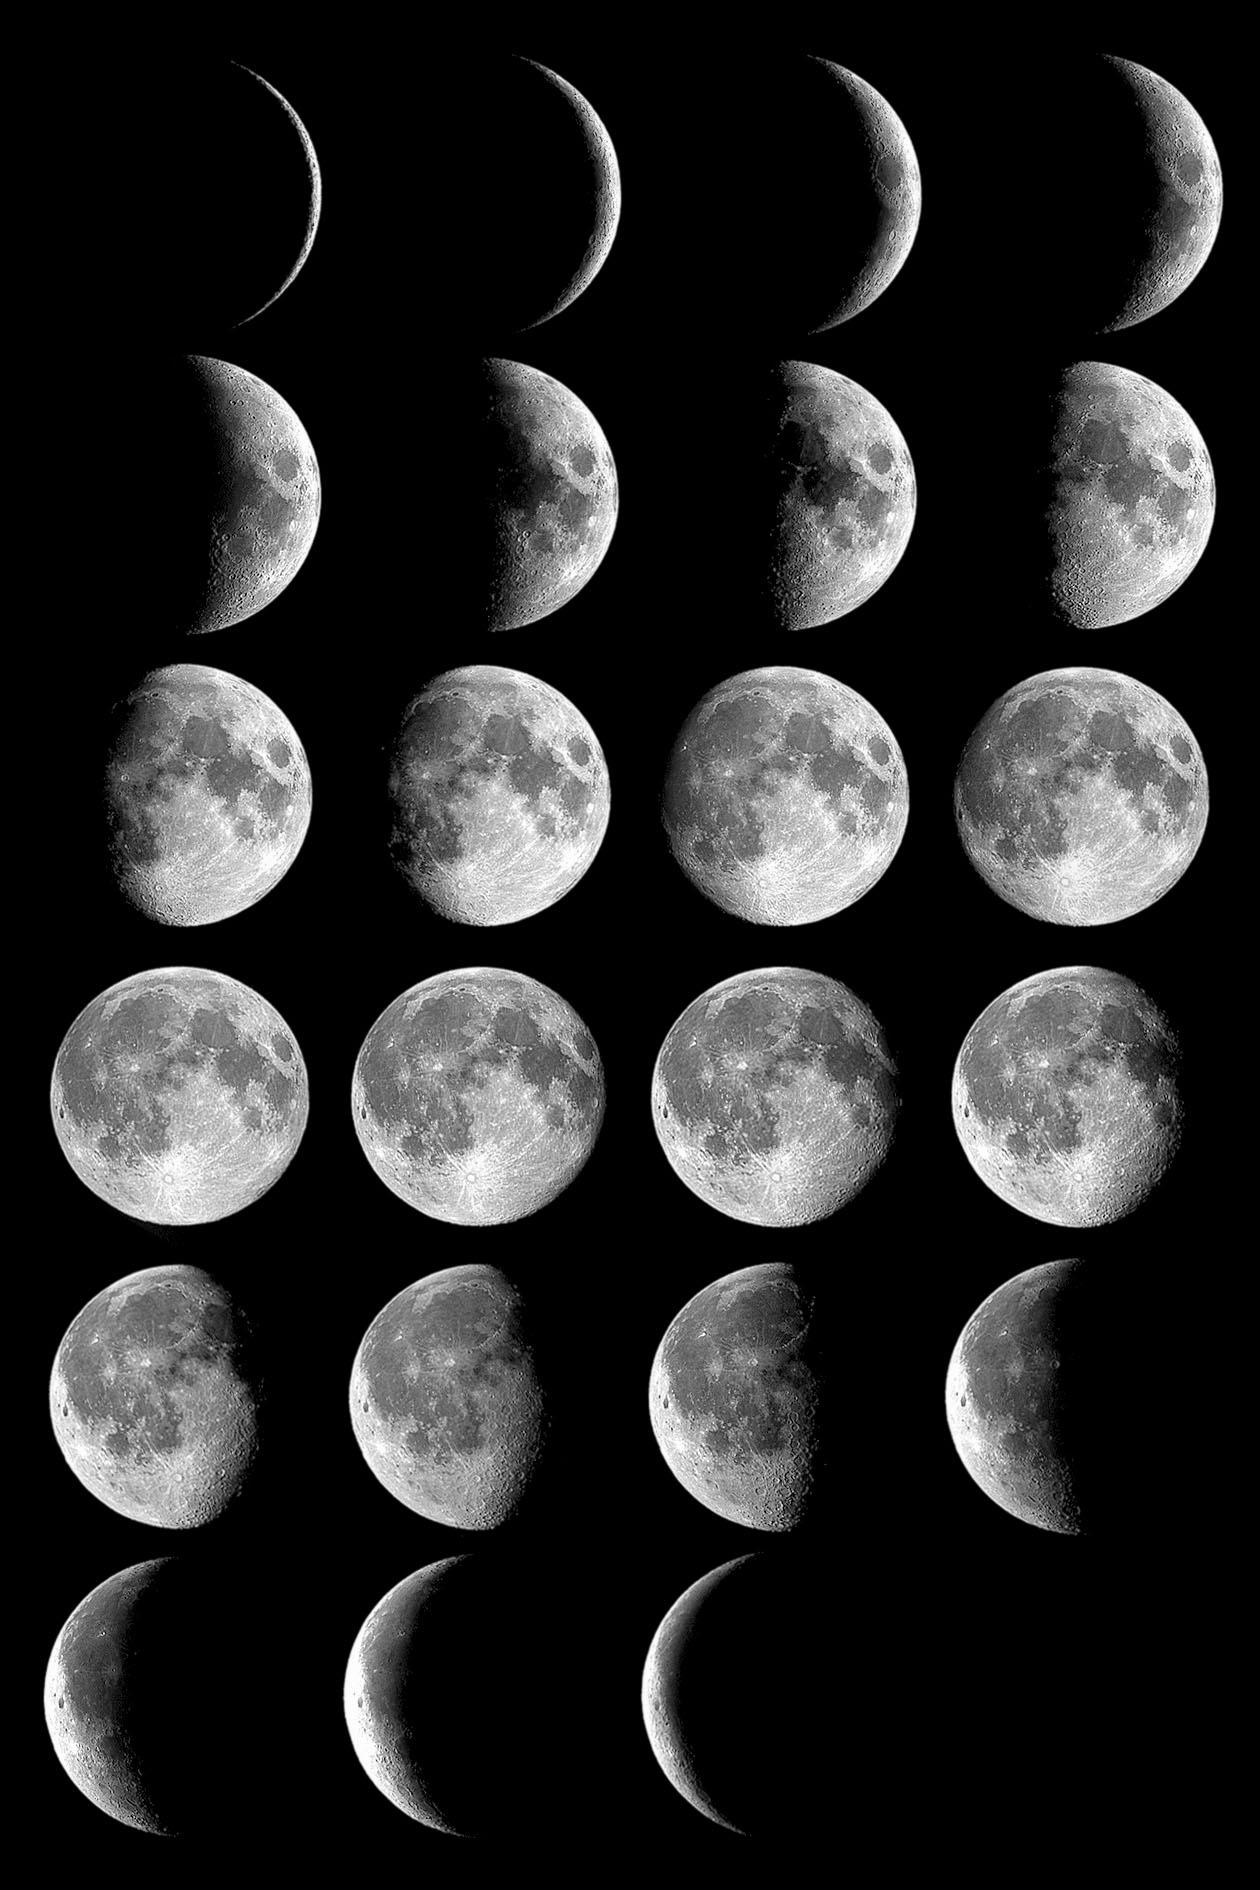 https://stariel.com/wp-content/uploads/2021/02/moon_phases1.jpg